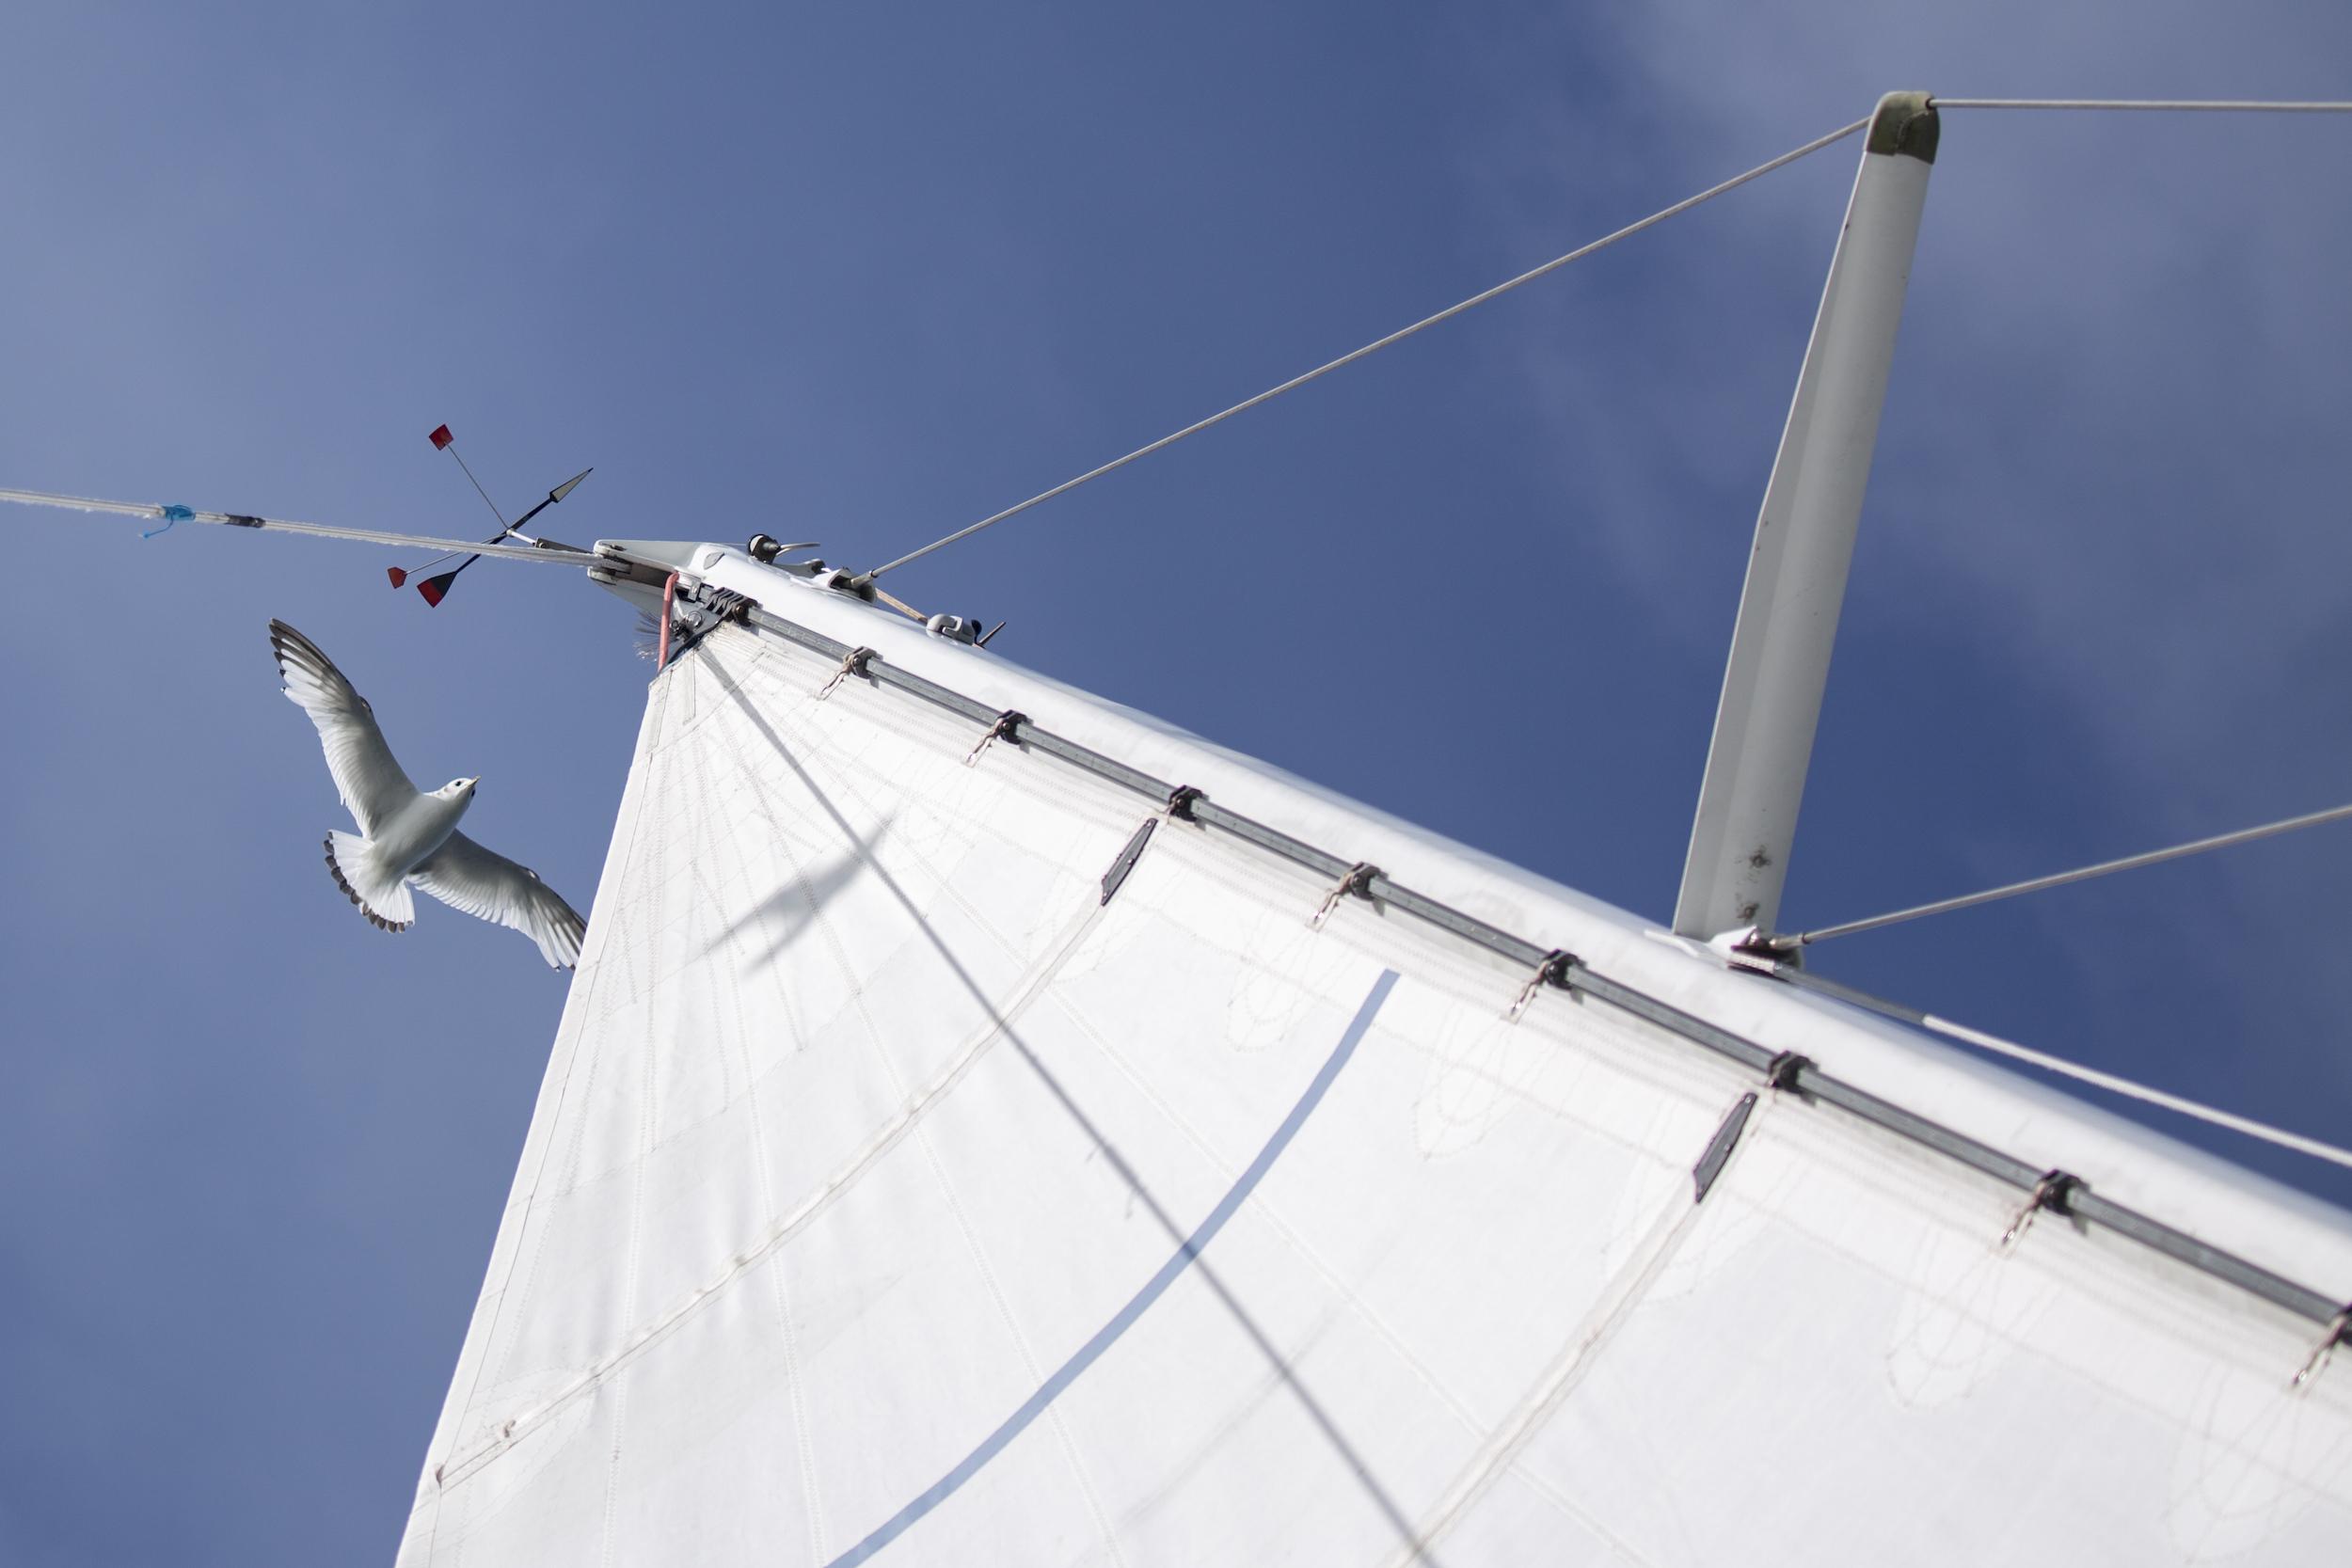 Gul matching Isbjorn's windvane offshore en route to Svalbard.